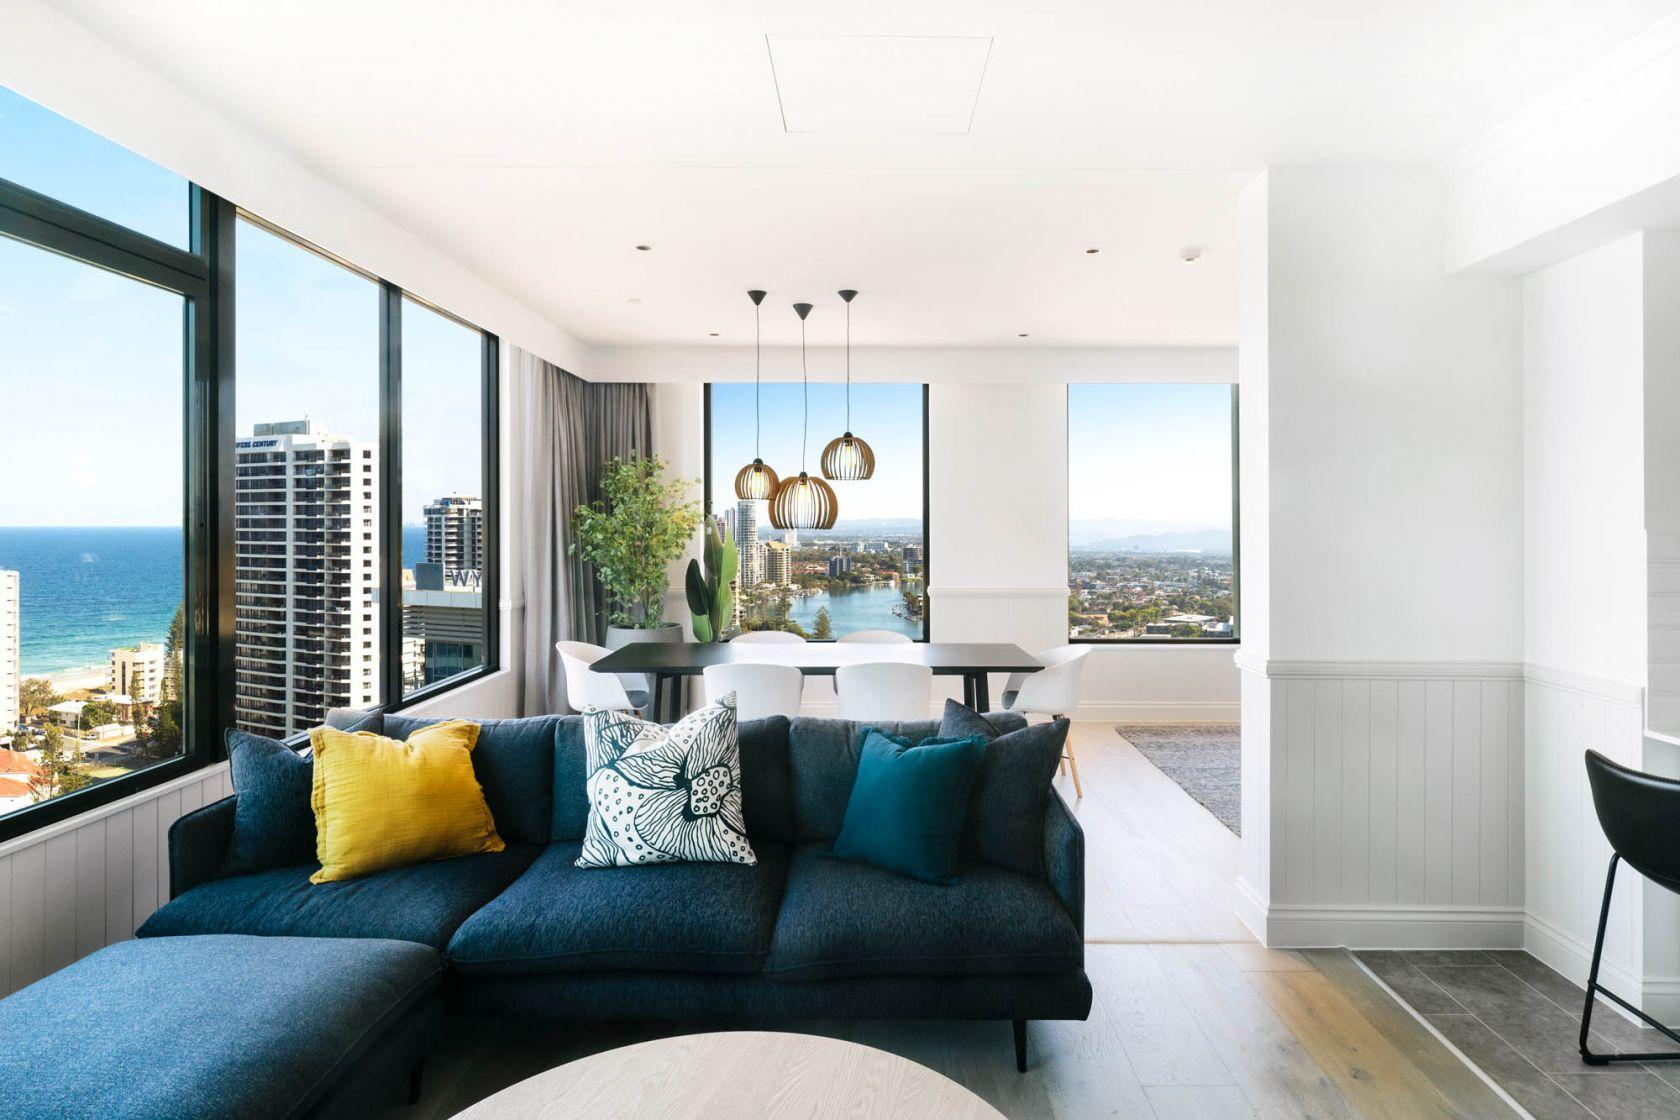 voco hotel gold coast fitout refurbishment construction executive suite lounge